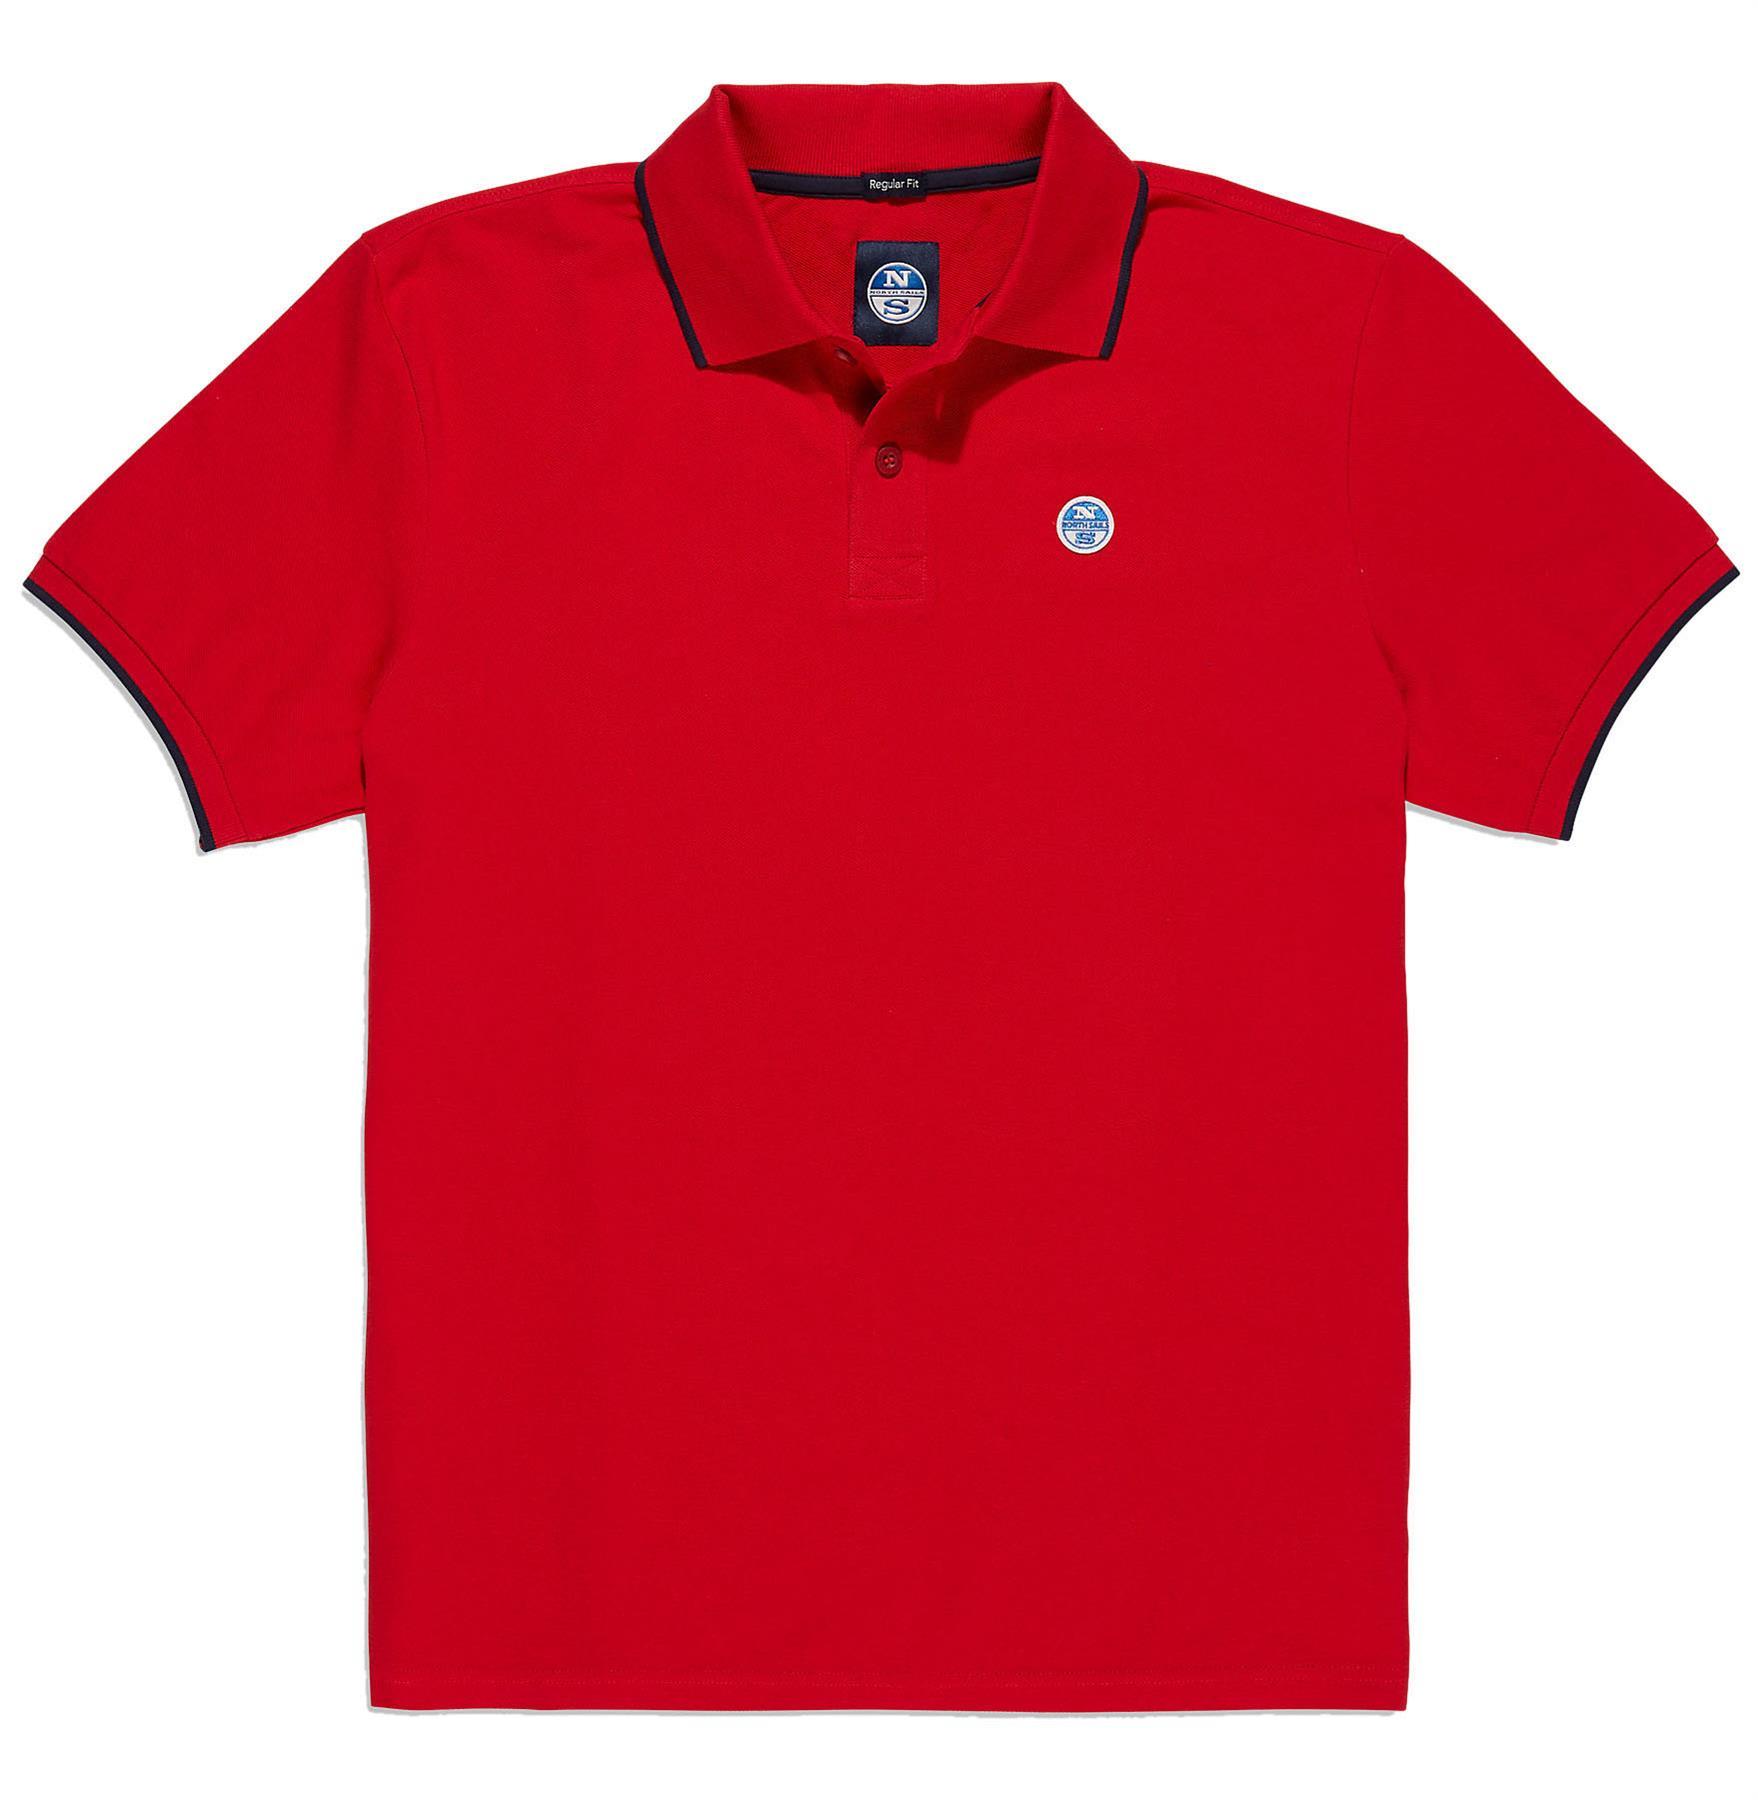 NORTH-SAILS-Mens-Legacy-Heritage-Short-Sleeve-Polo-Shirt-SALE-RRP-50 thumbnail 54